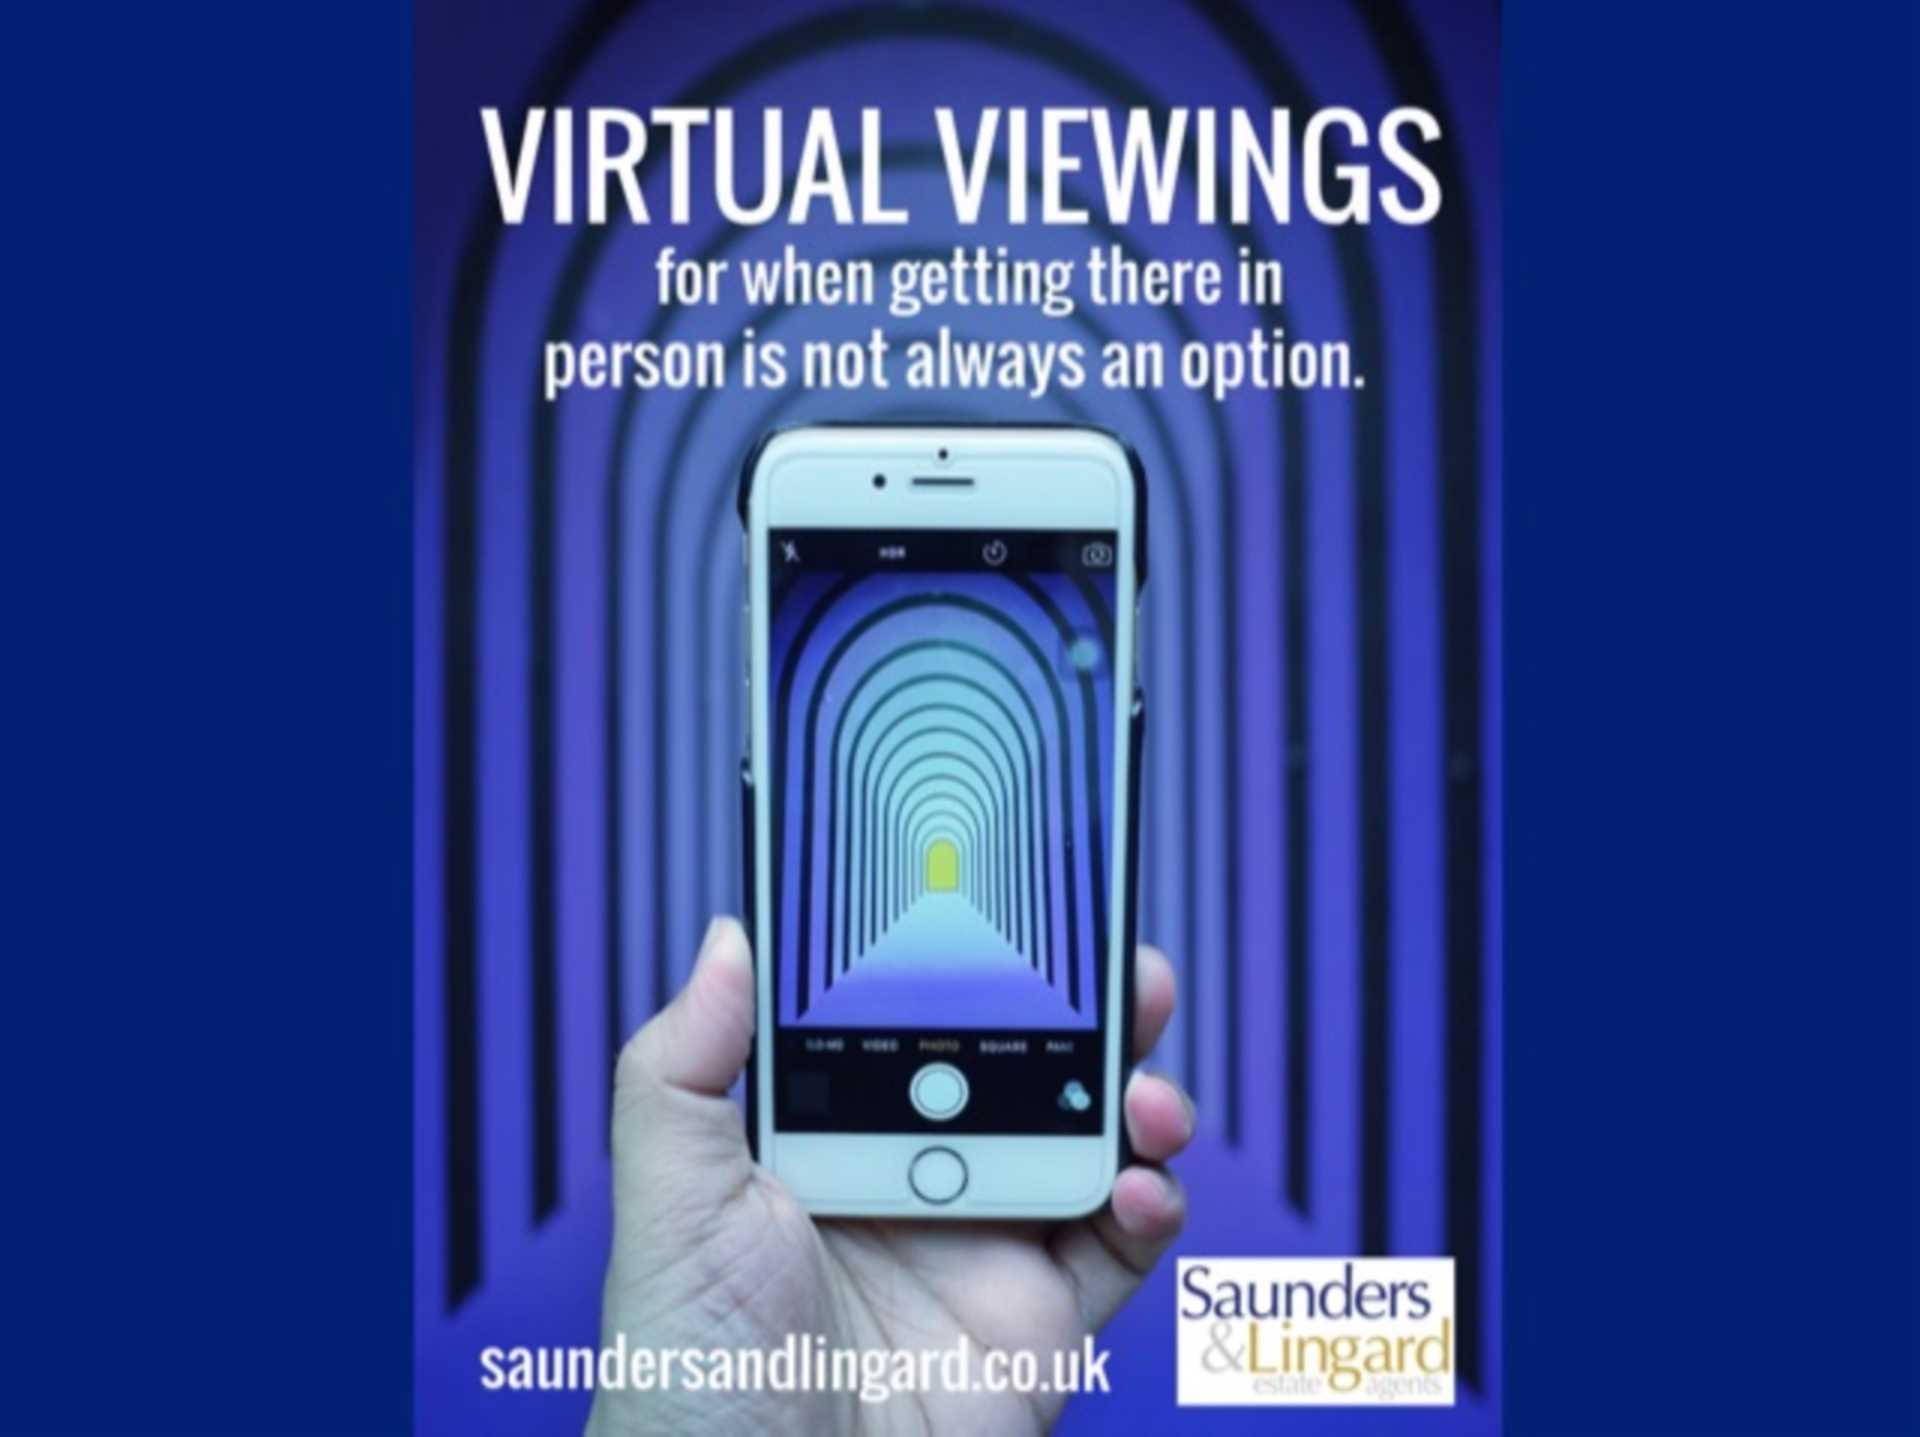 VIRTUAL VIEWINGS...